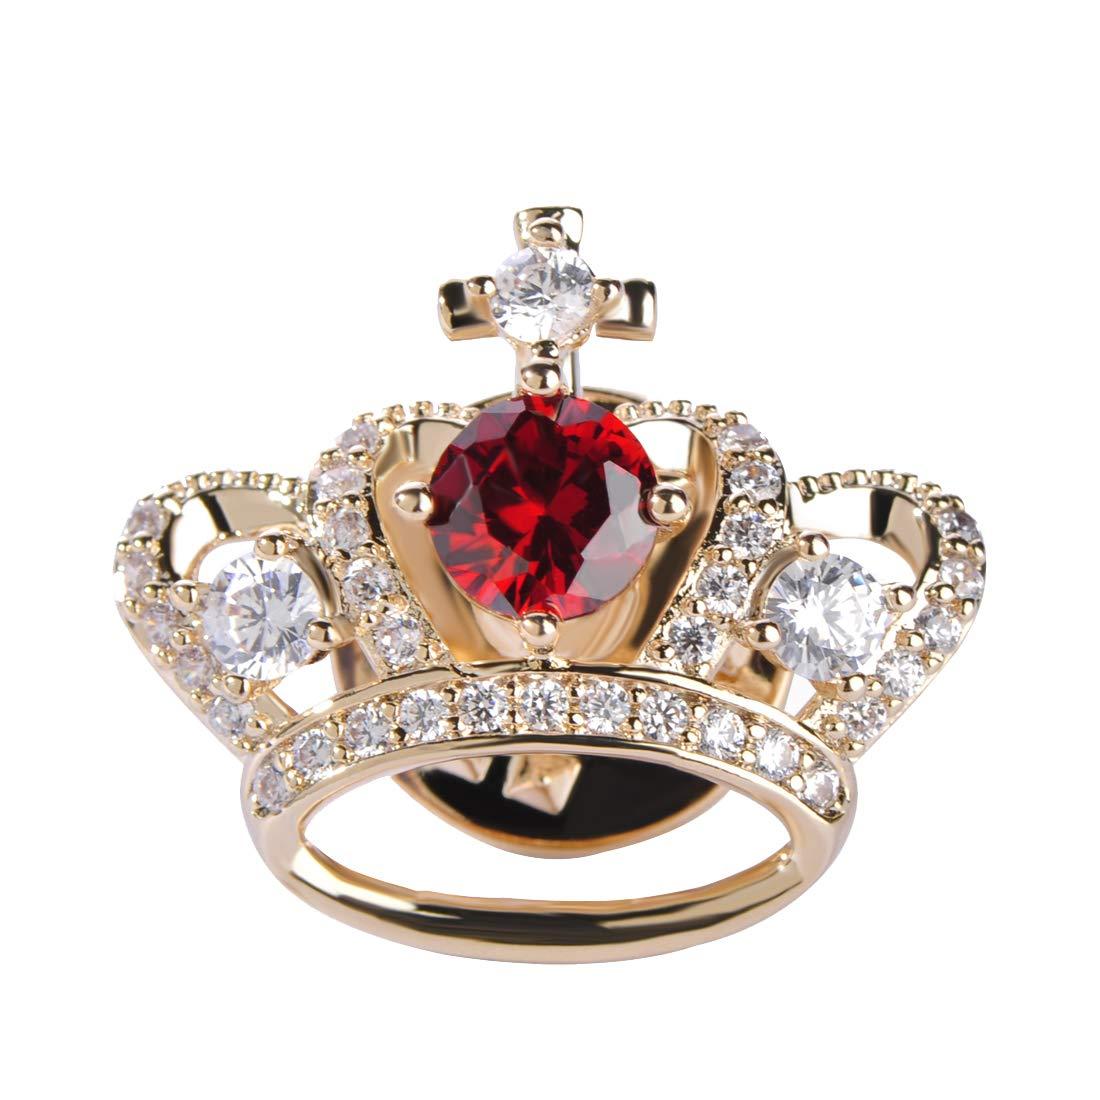 4679d30c8e3 MECHOSEN Copper Metal Brooch Pins Real Zircons Royal Princess Queen Crown  B0719Q8BHB_US